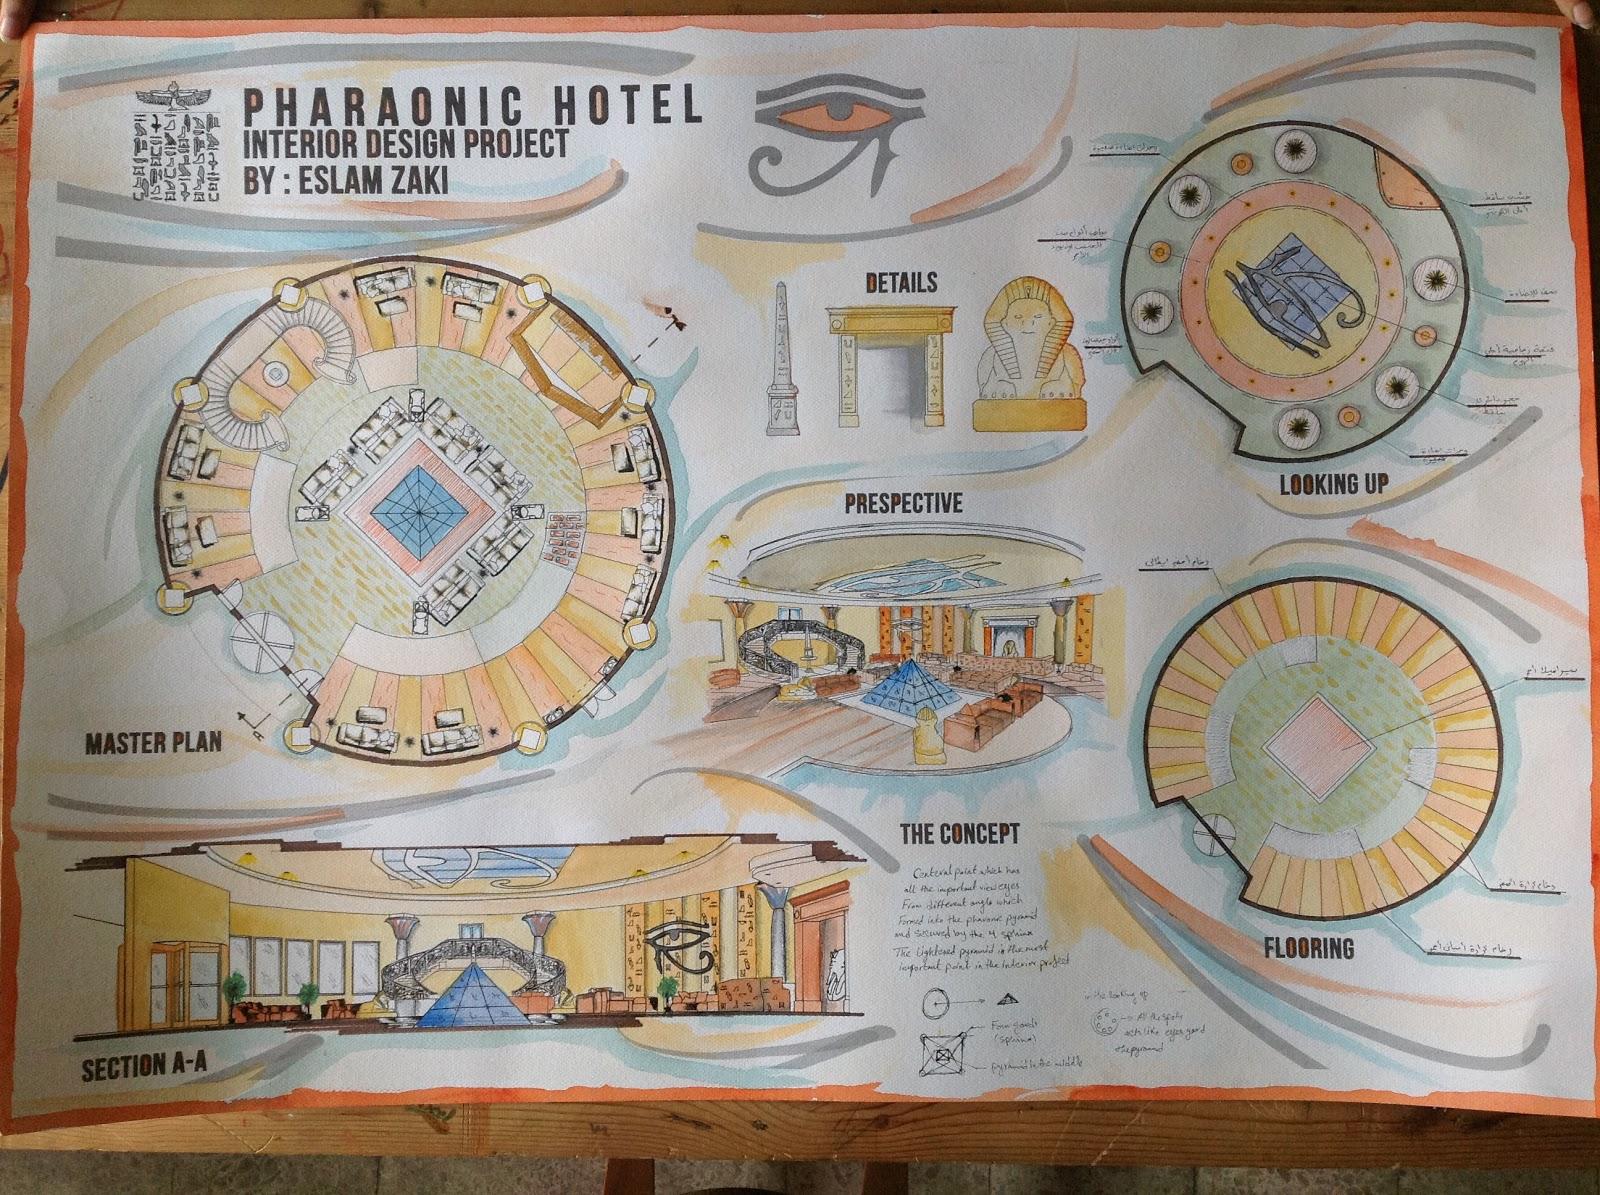 Eslam Zaki: Pharaonic Hotel Reseption (interior design )